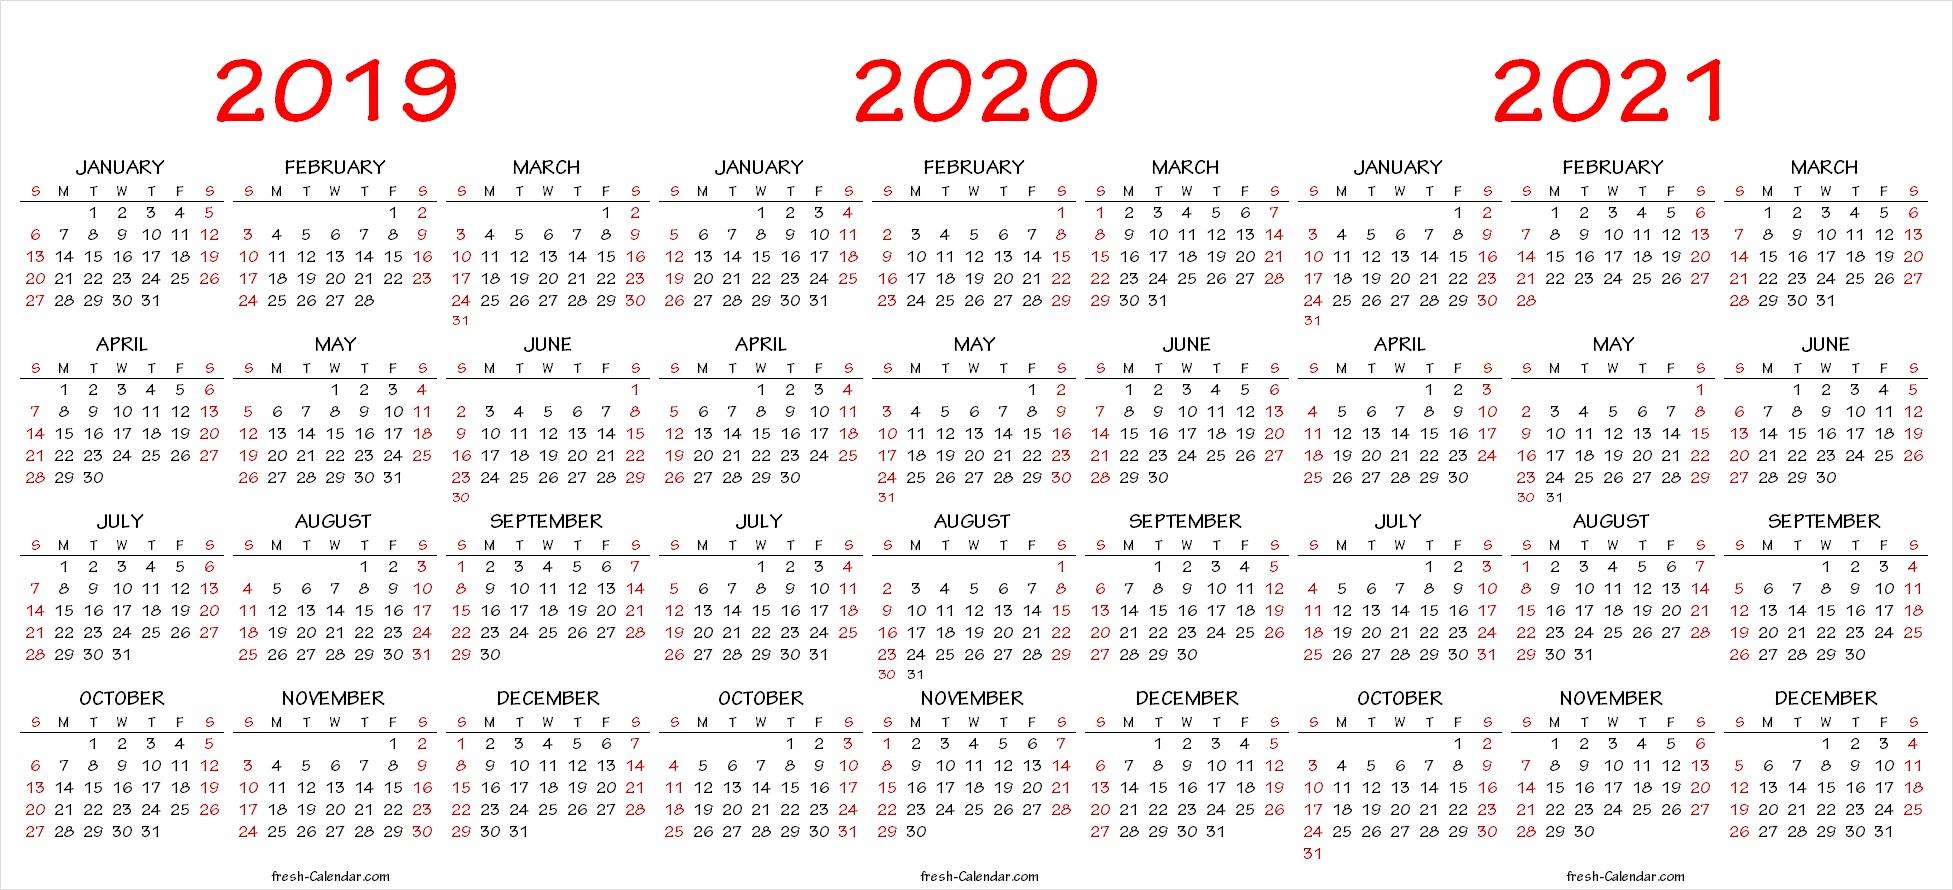 Three Yearly Calendar 2019 2020 2021 Printable Free | Blank Template throughout Free Printaabke Calendars For 2019-2020